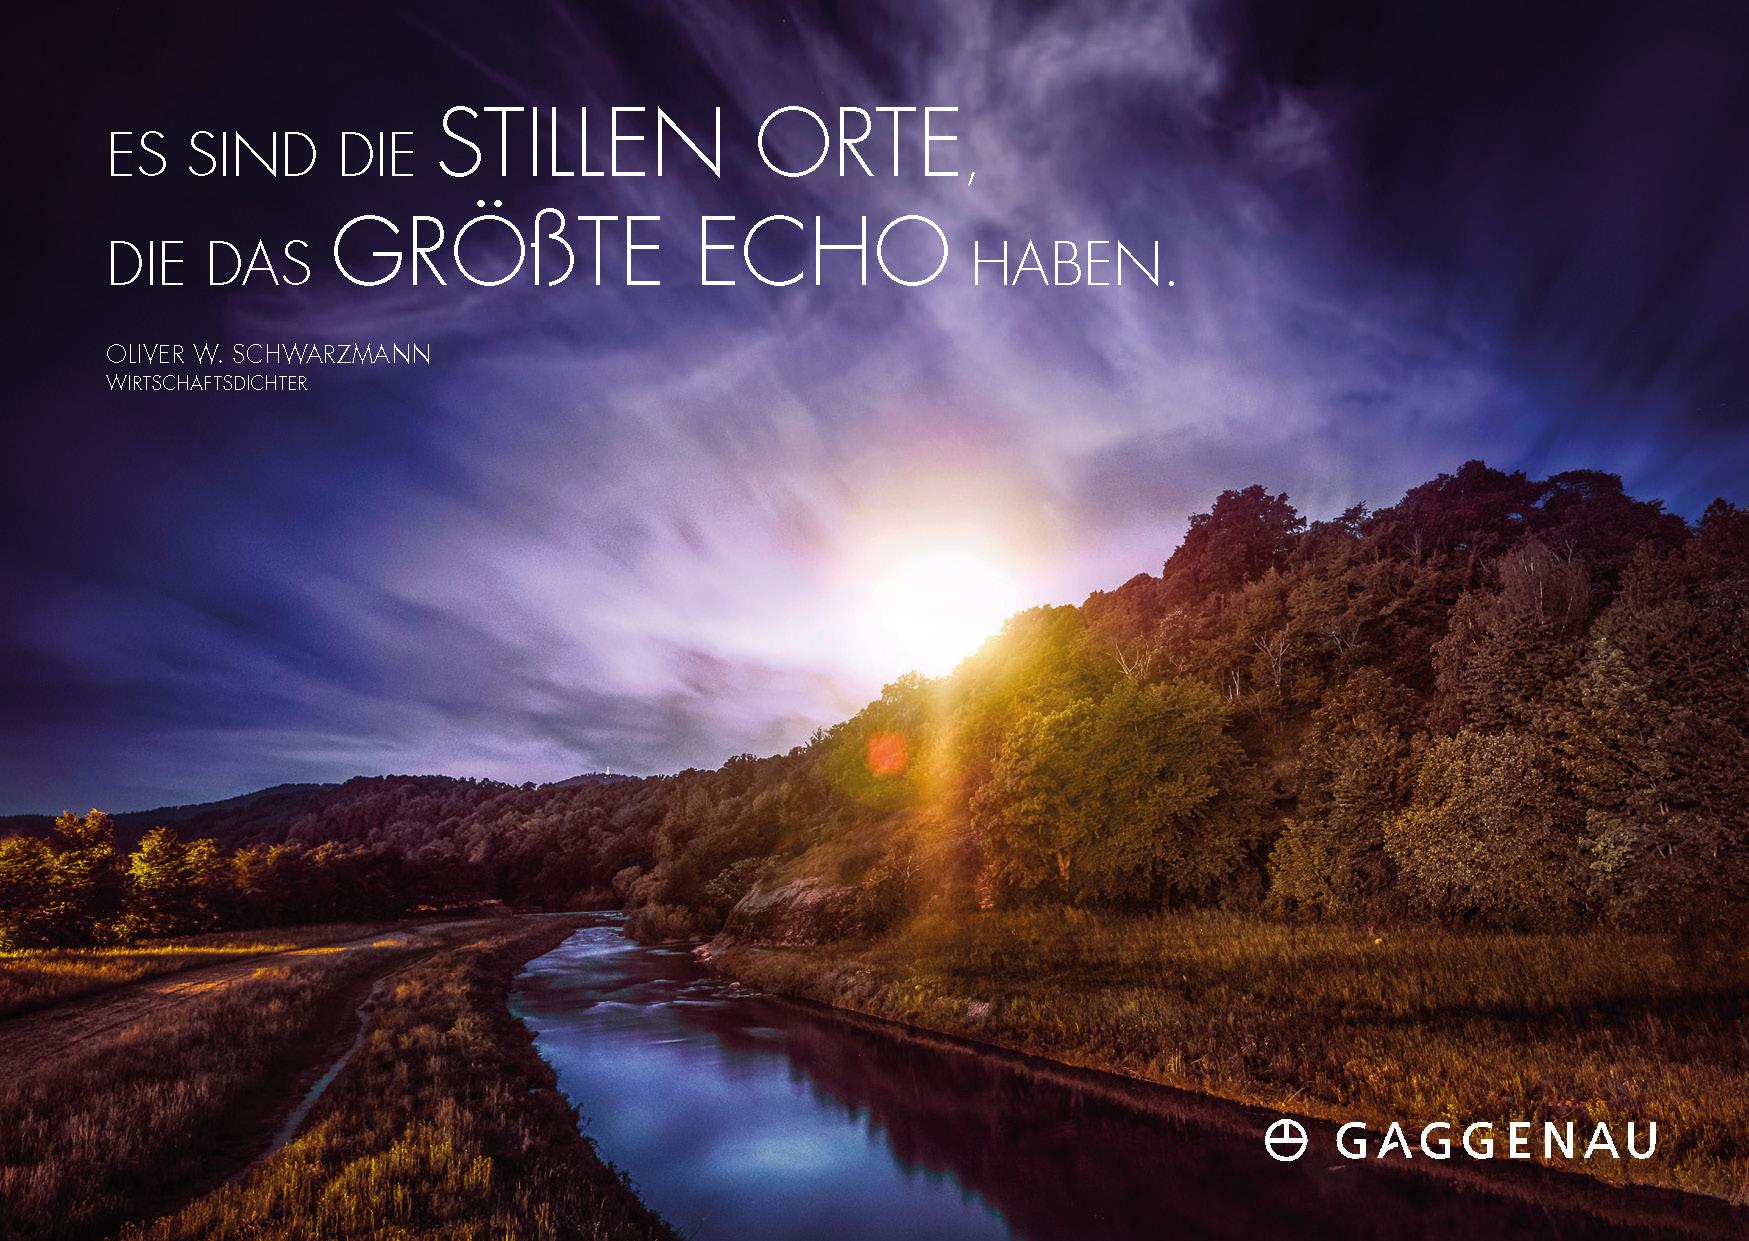 Dichter-Postkarte Stadt Gaggenau